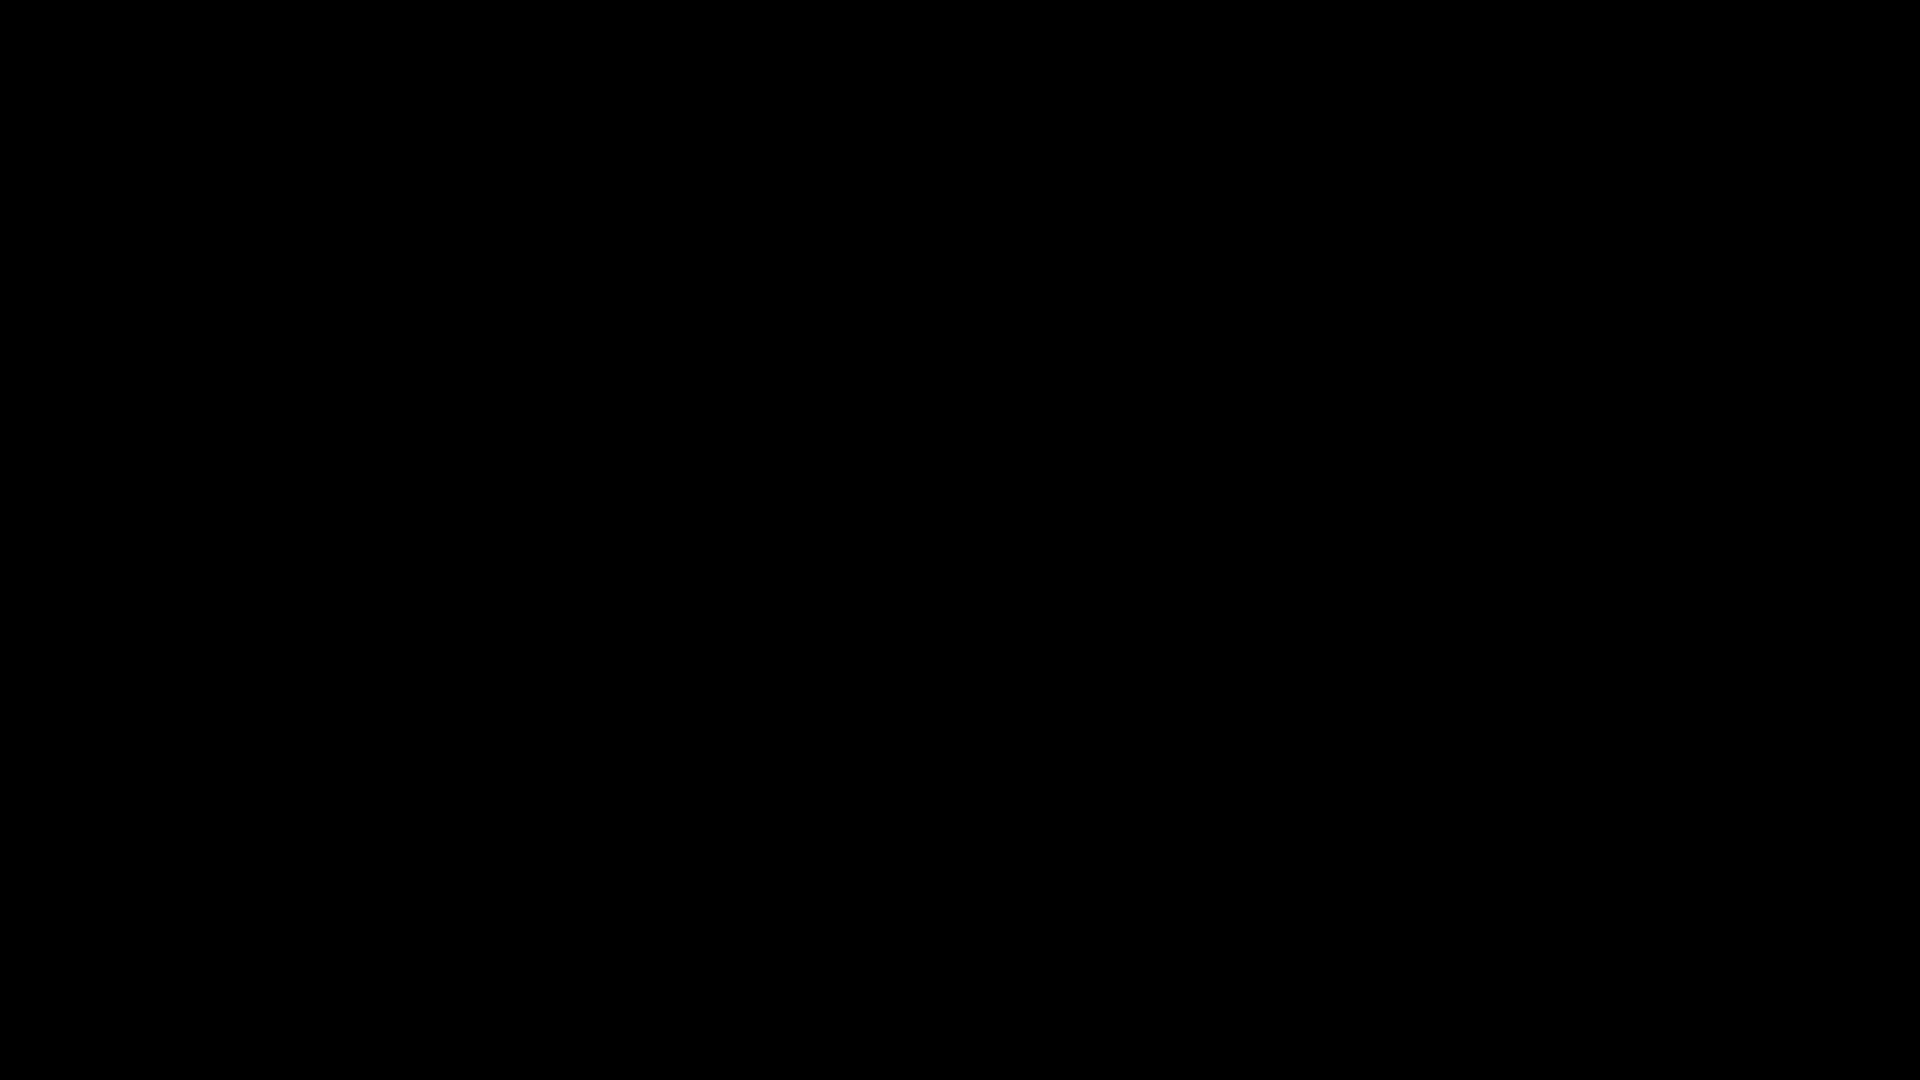 高画質露天女風呂観察 vol.032 Hな乙女 オマンコ無修正動画無料 103pic 14